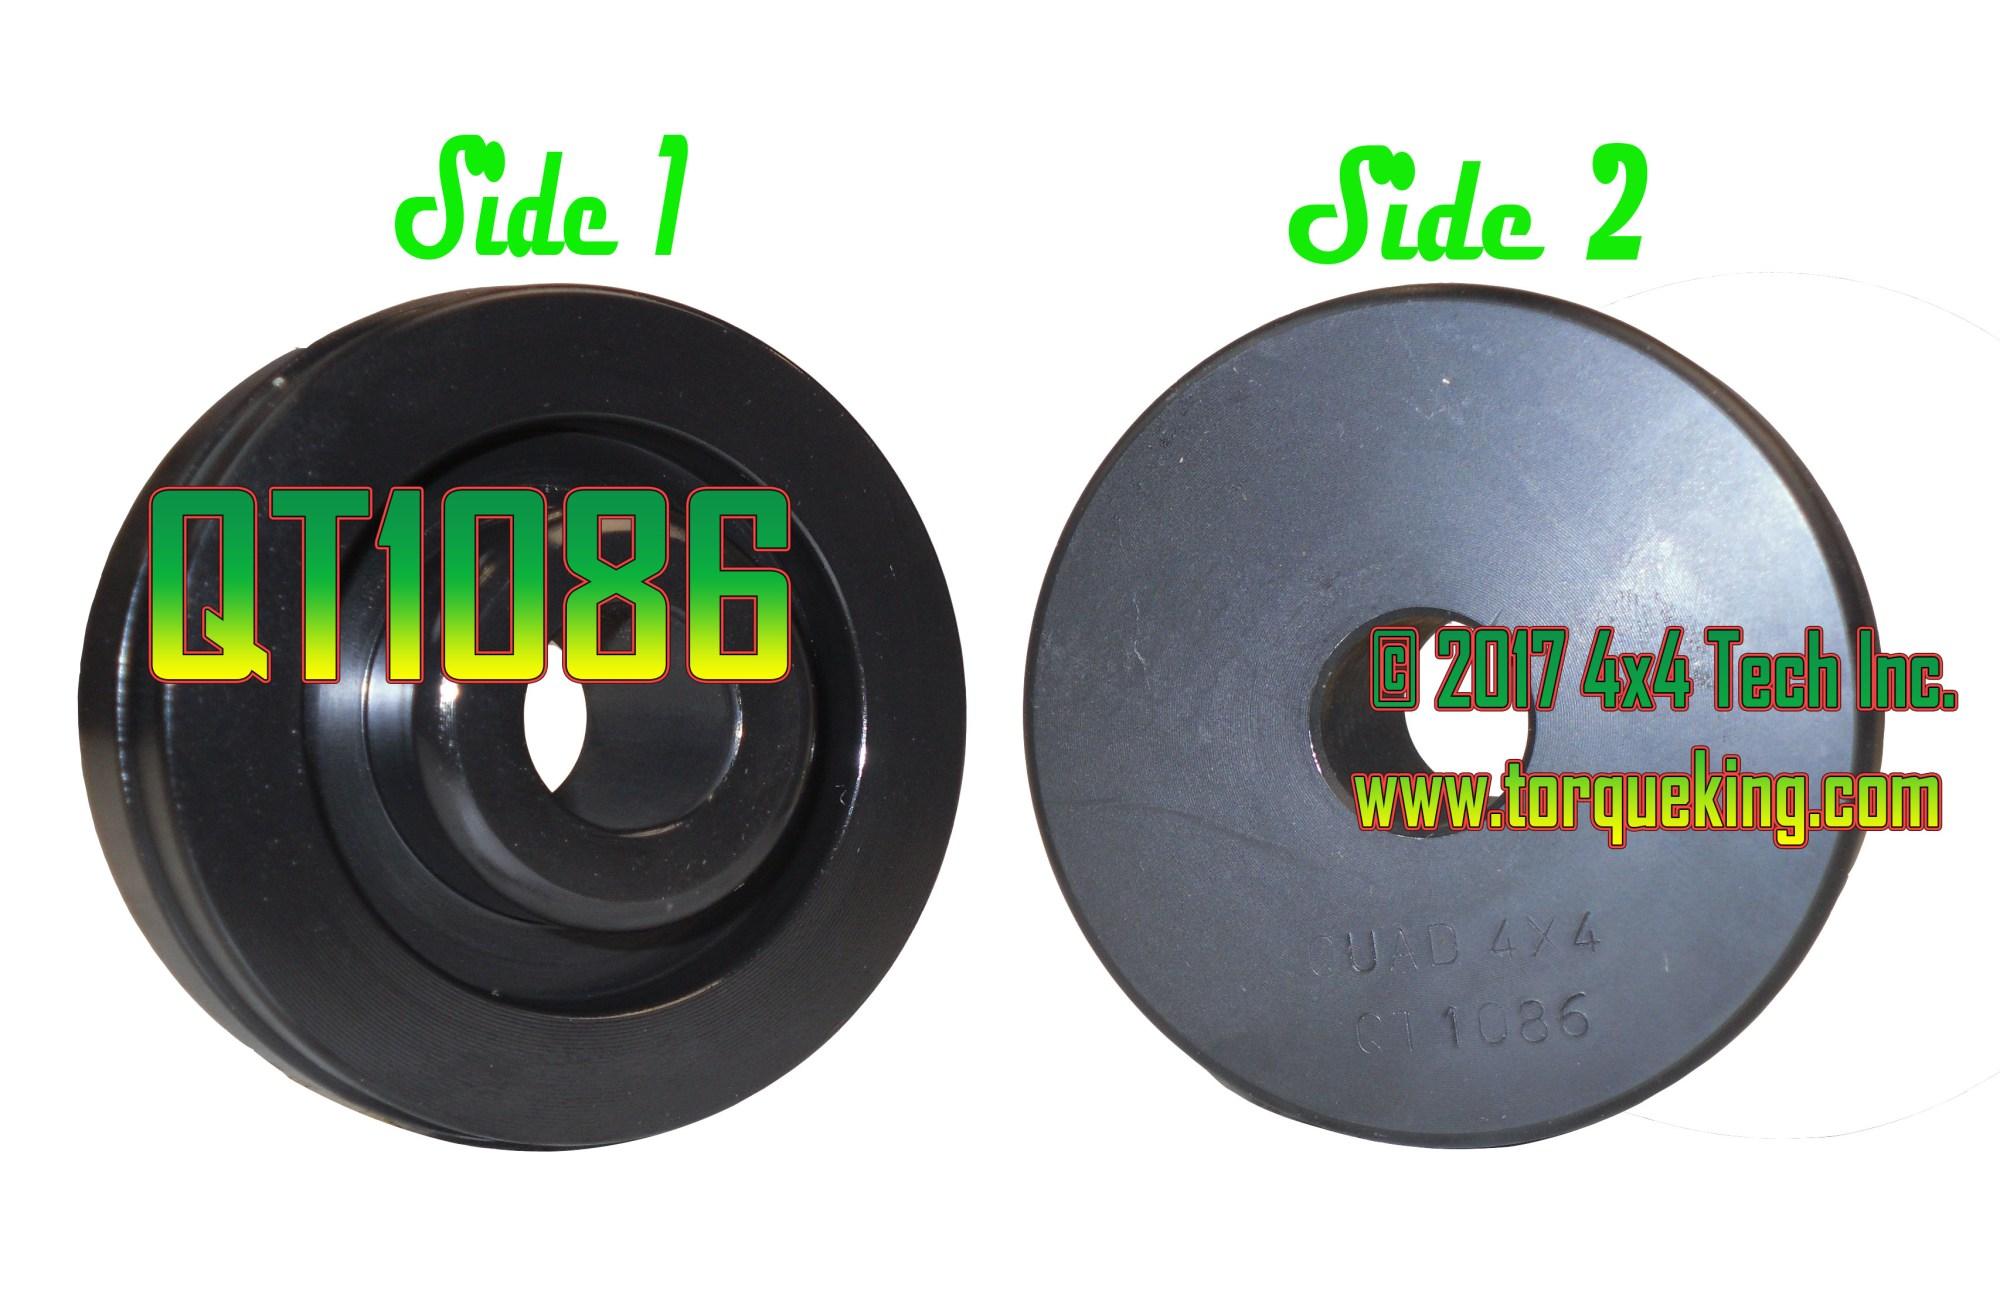 hight resolution of qt1086 1974 1977 5 ford dana 60 and 1978 1979 ford dana 44 large diameter inner axle shaft seal installer installs qu40160 2 5 8 outside diameter inner